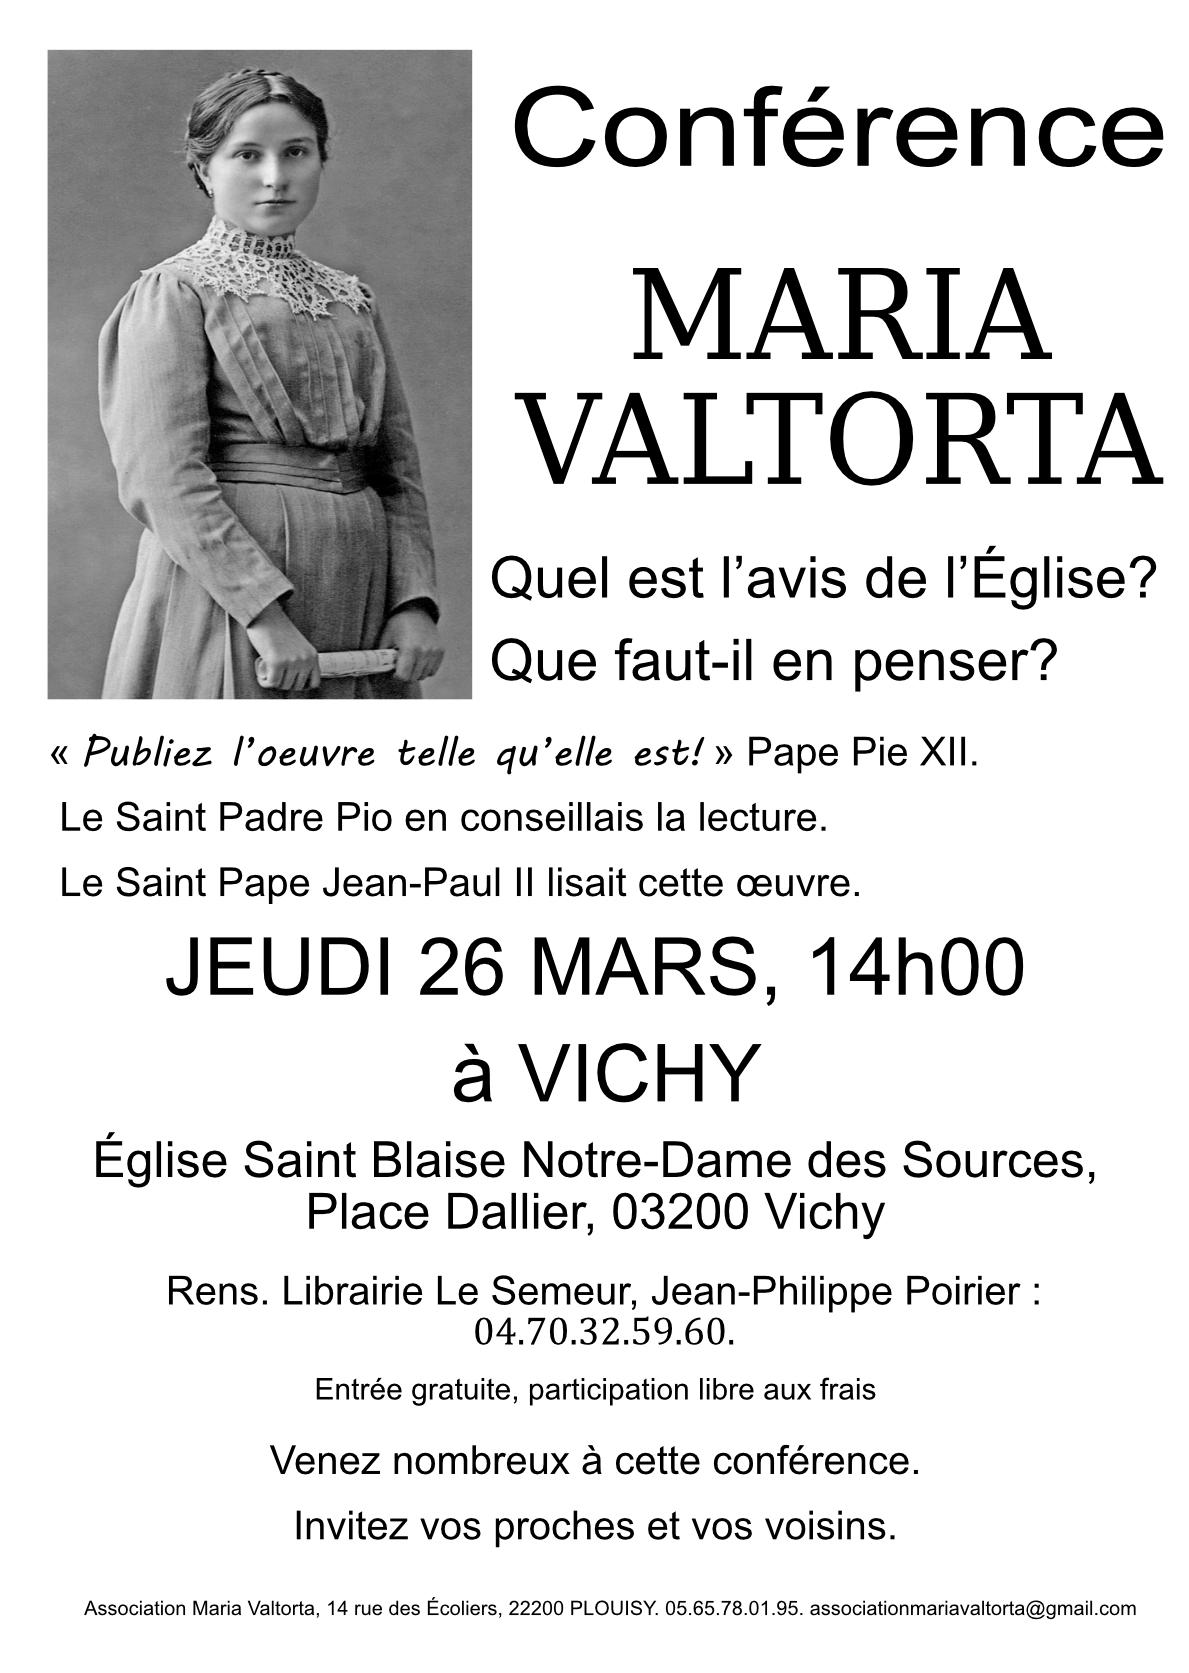 26 mars Conférence Maria Valtorta